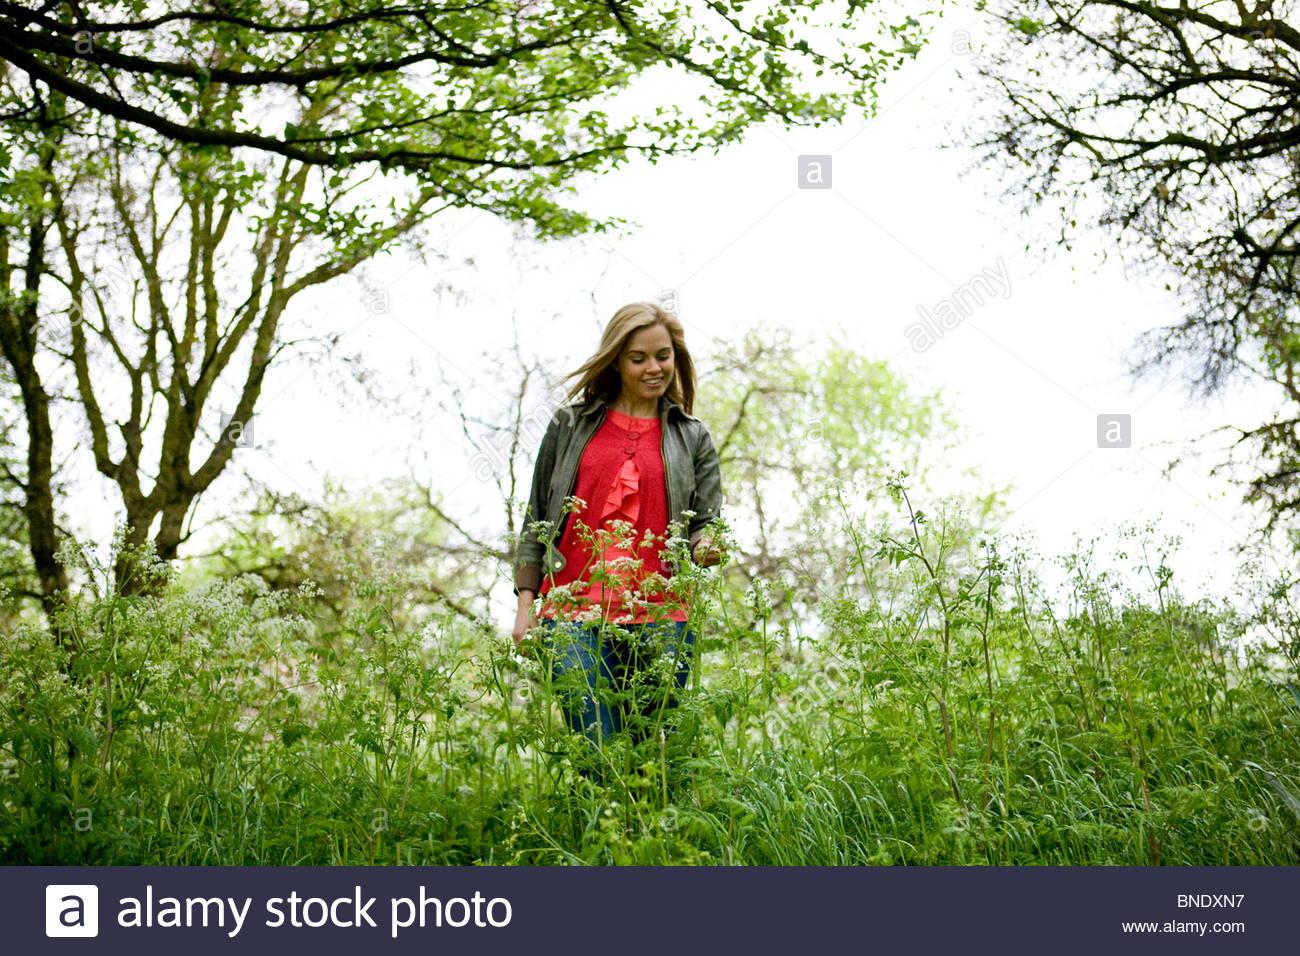 A young woman walking through long grass - Stock Image